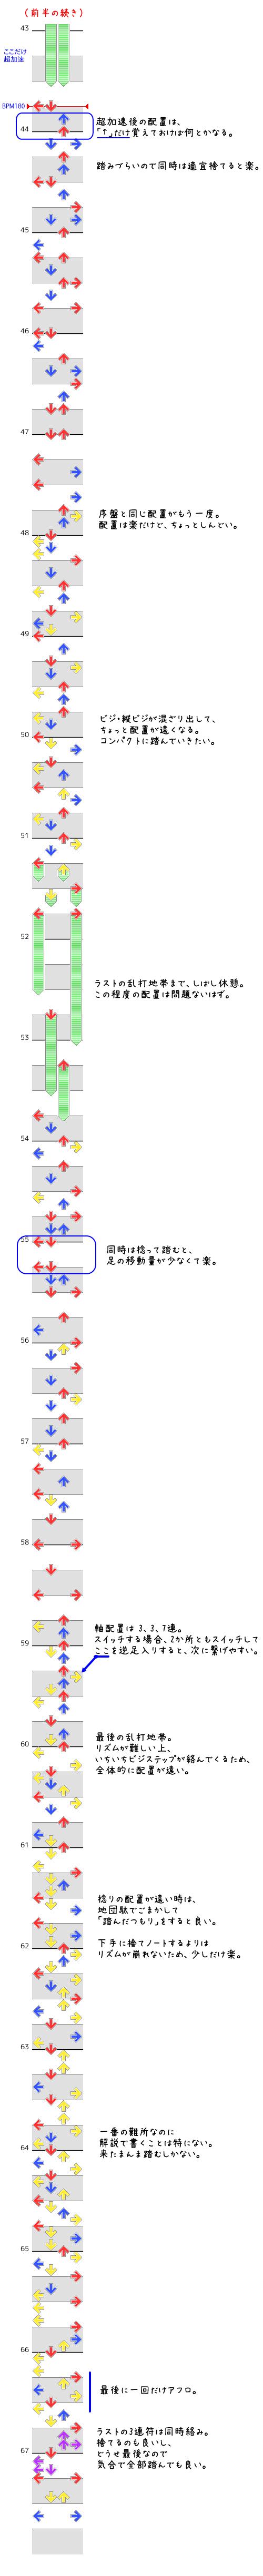 Gofor解説画像2